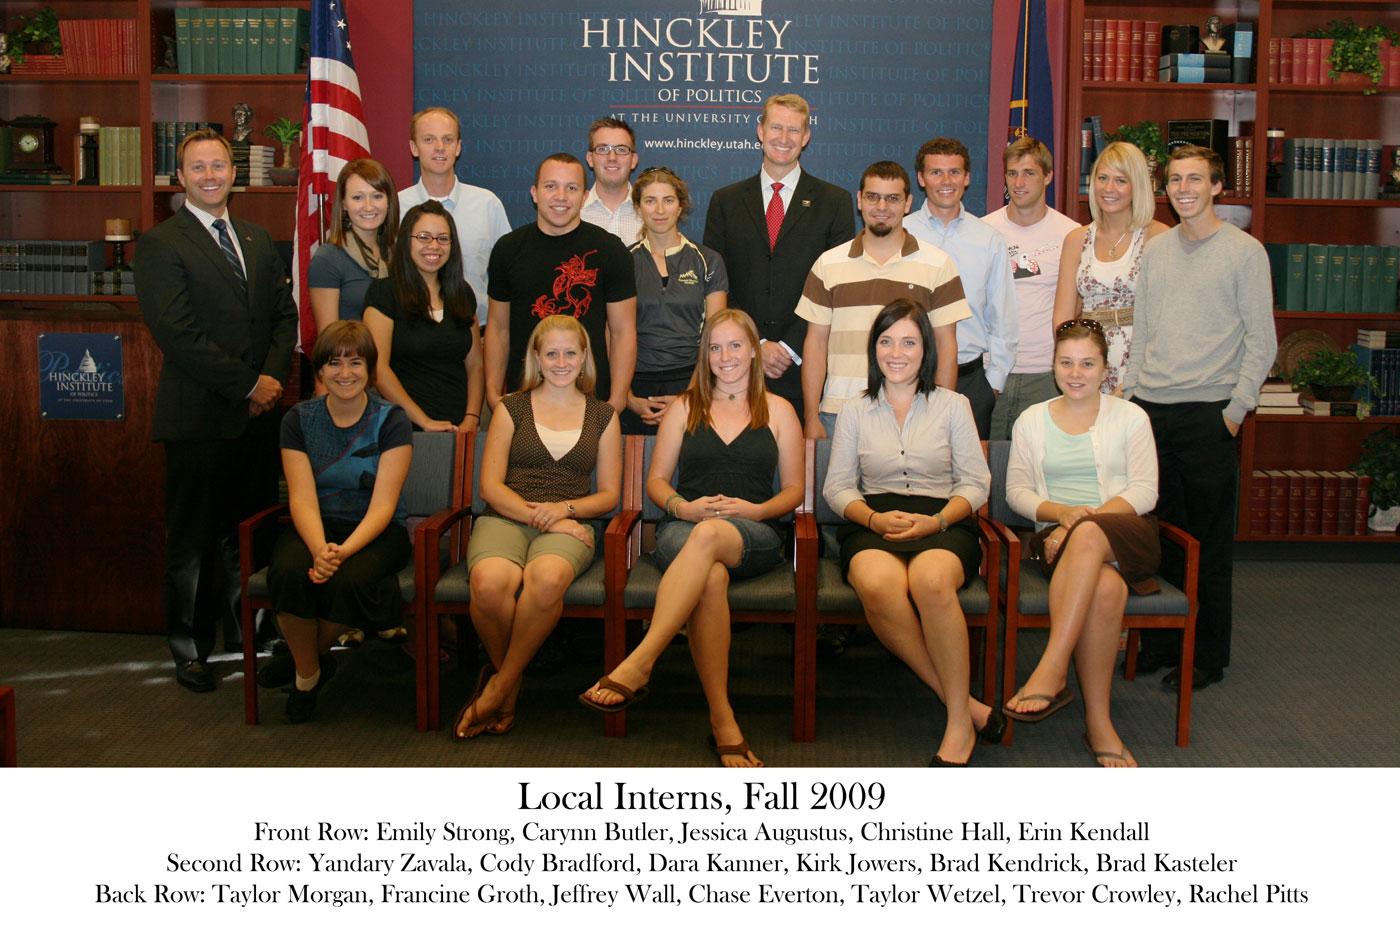 Local-Interns-Fall-2009.jpg